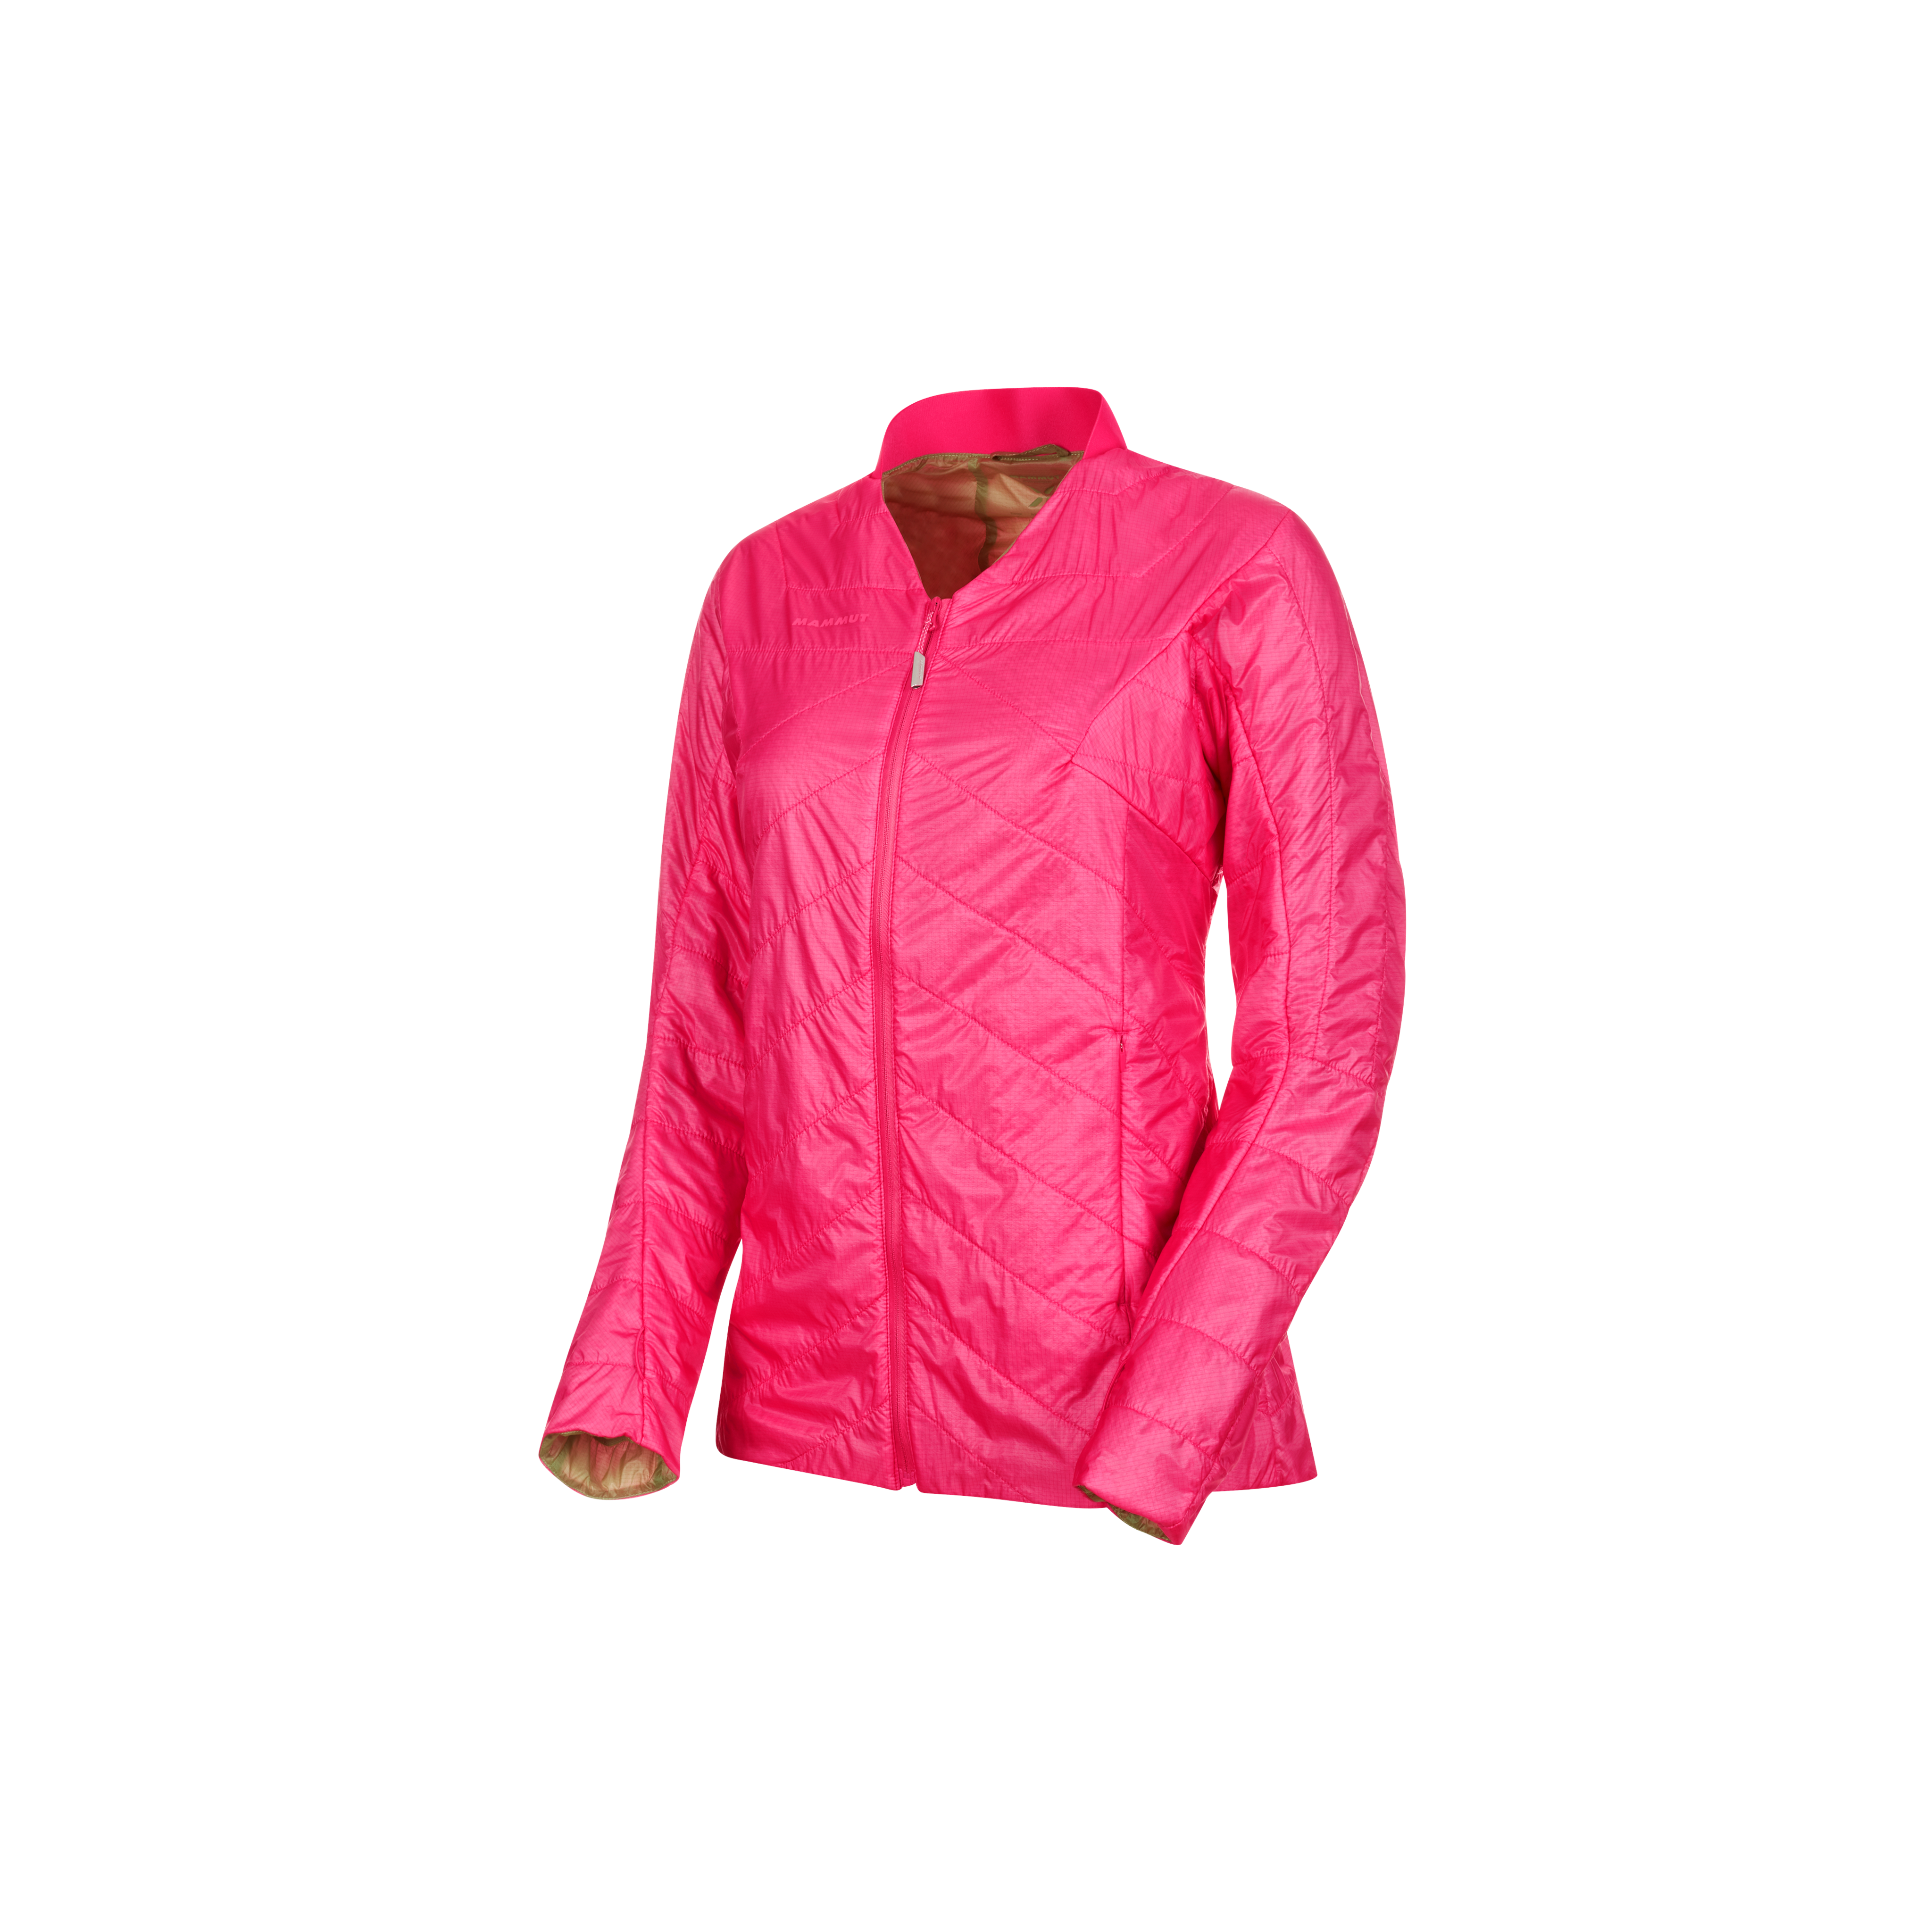 3850 IN Bomber Jacket Women - M, pink-boa thumbnail